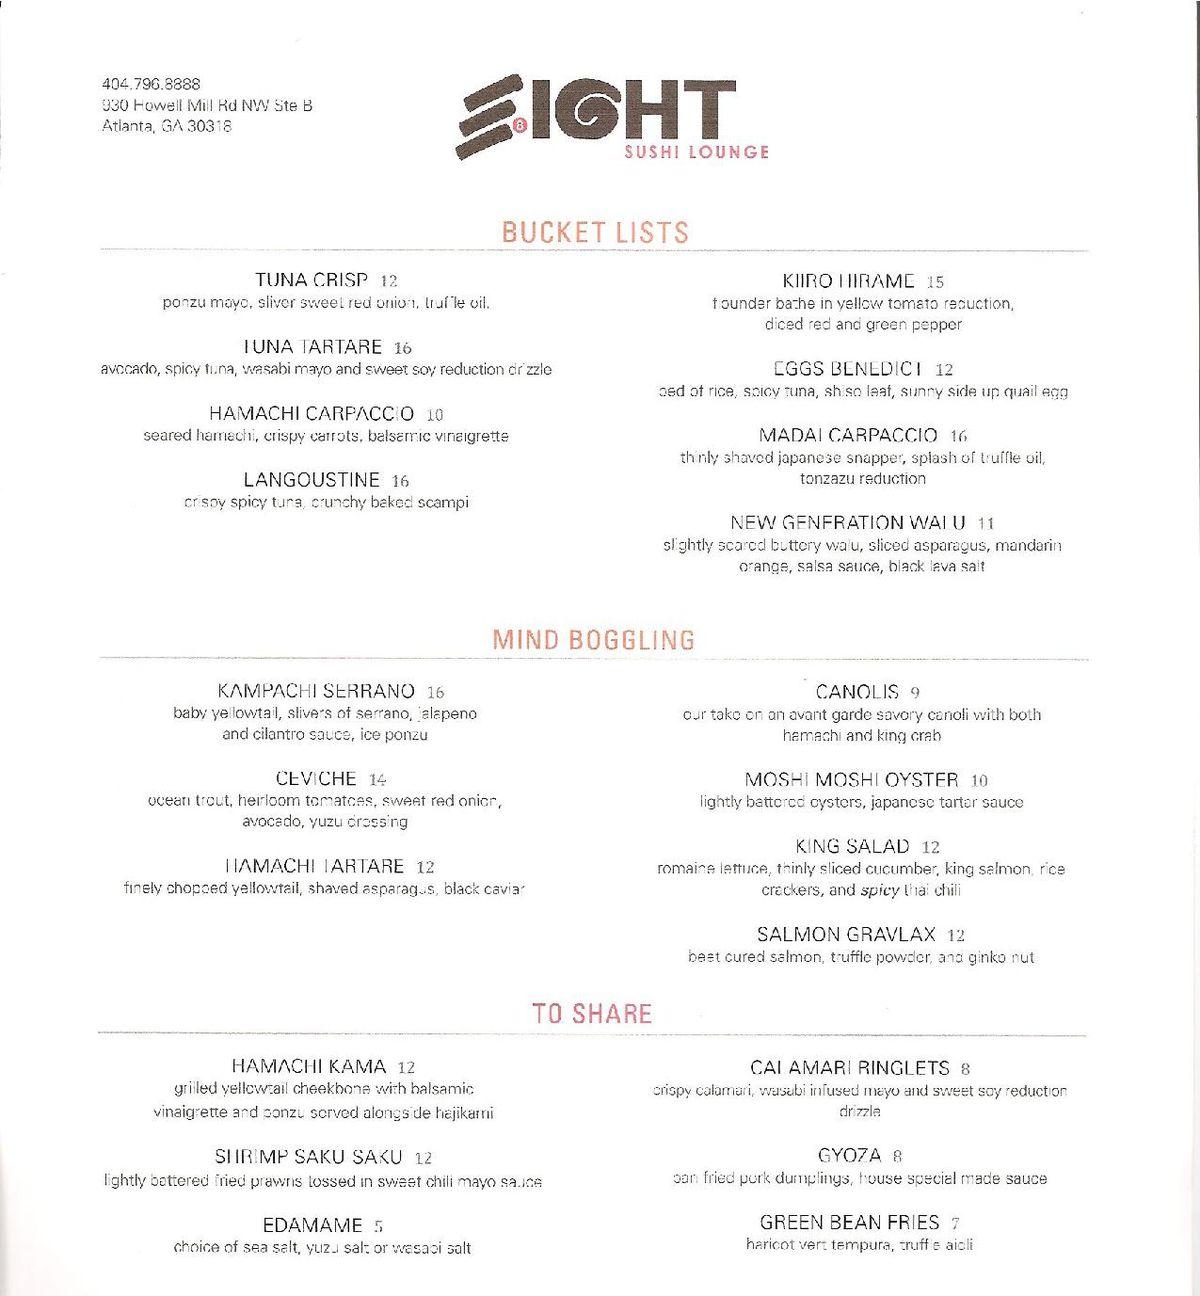 Eight Sushi Lounge menu